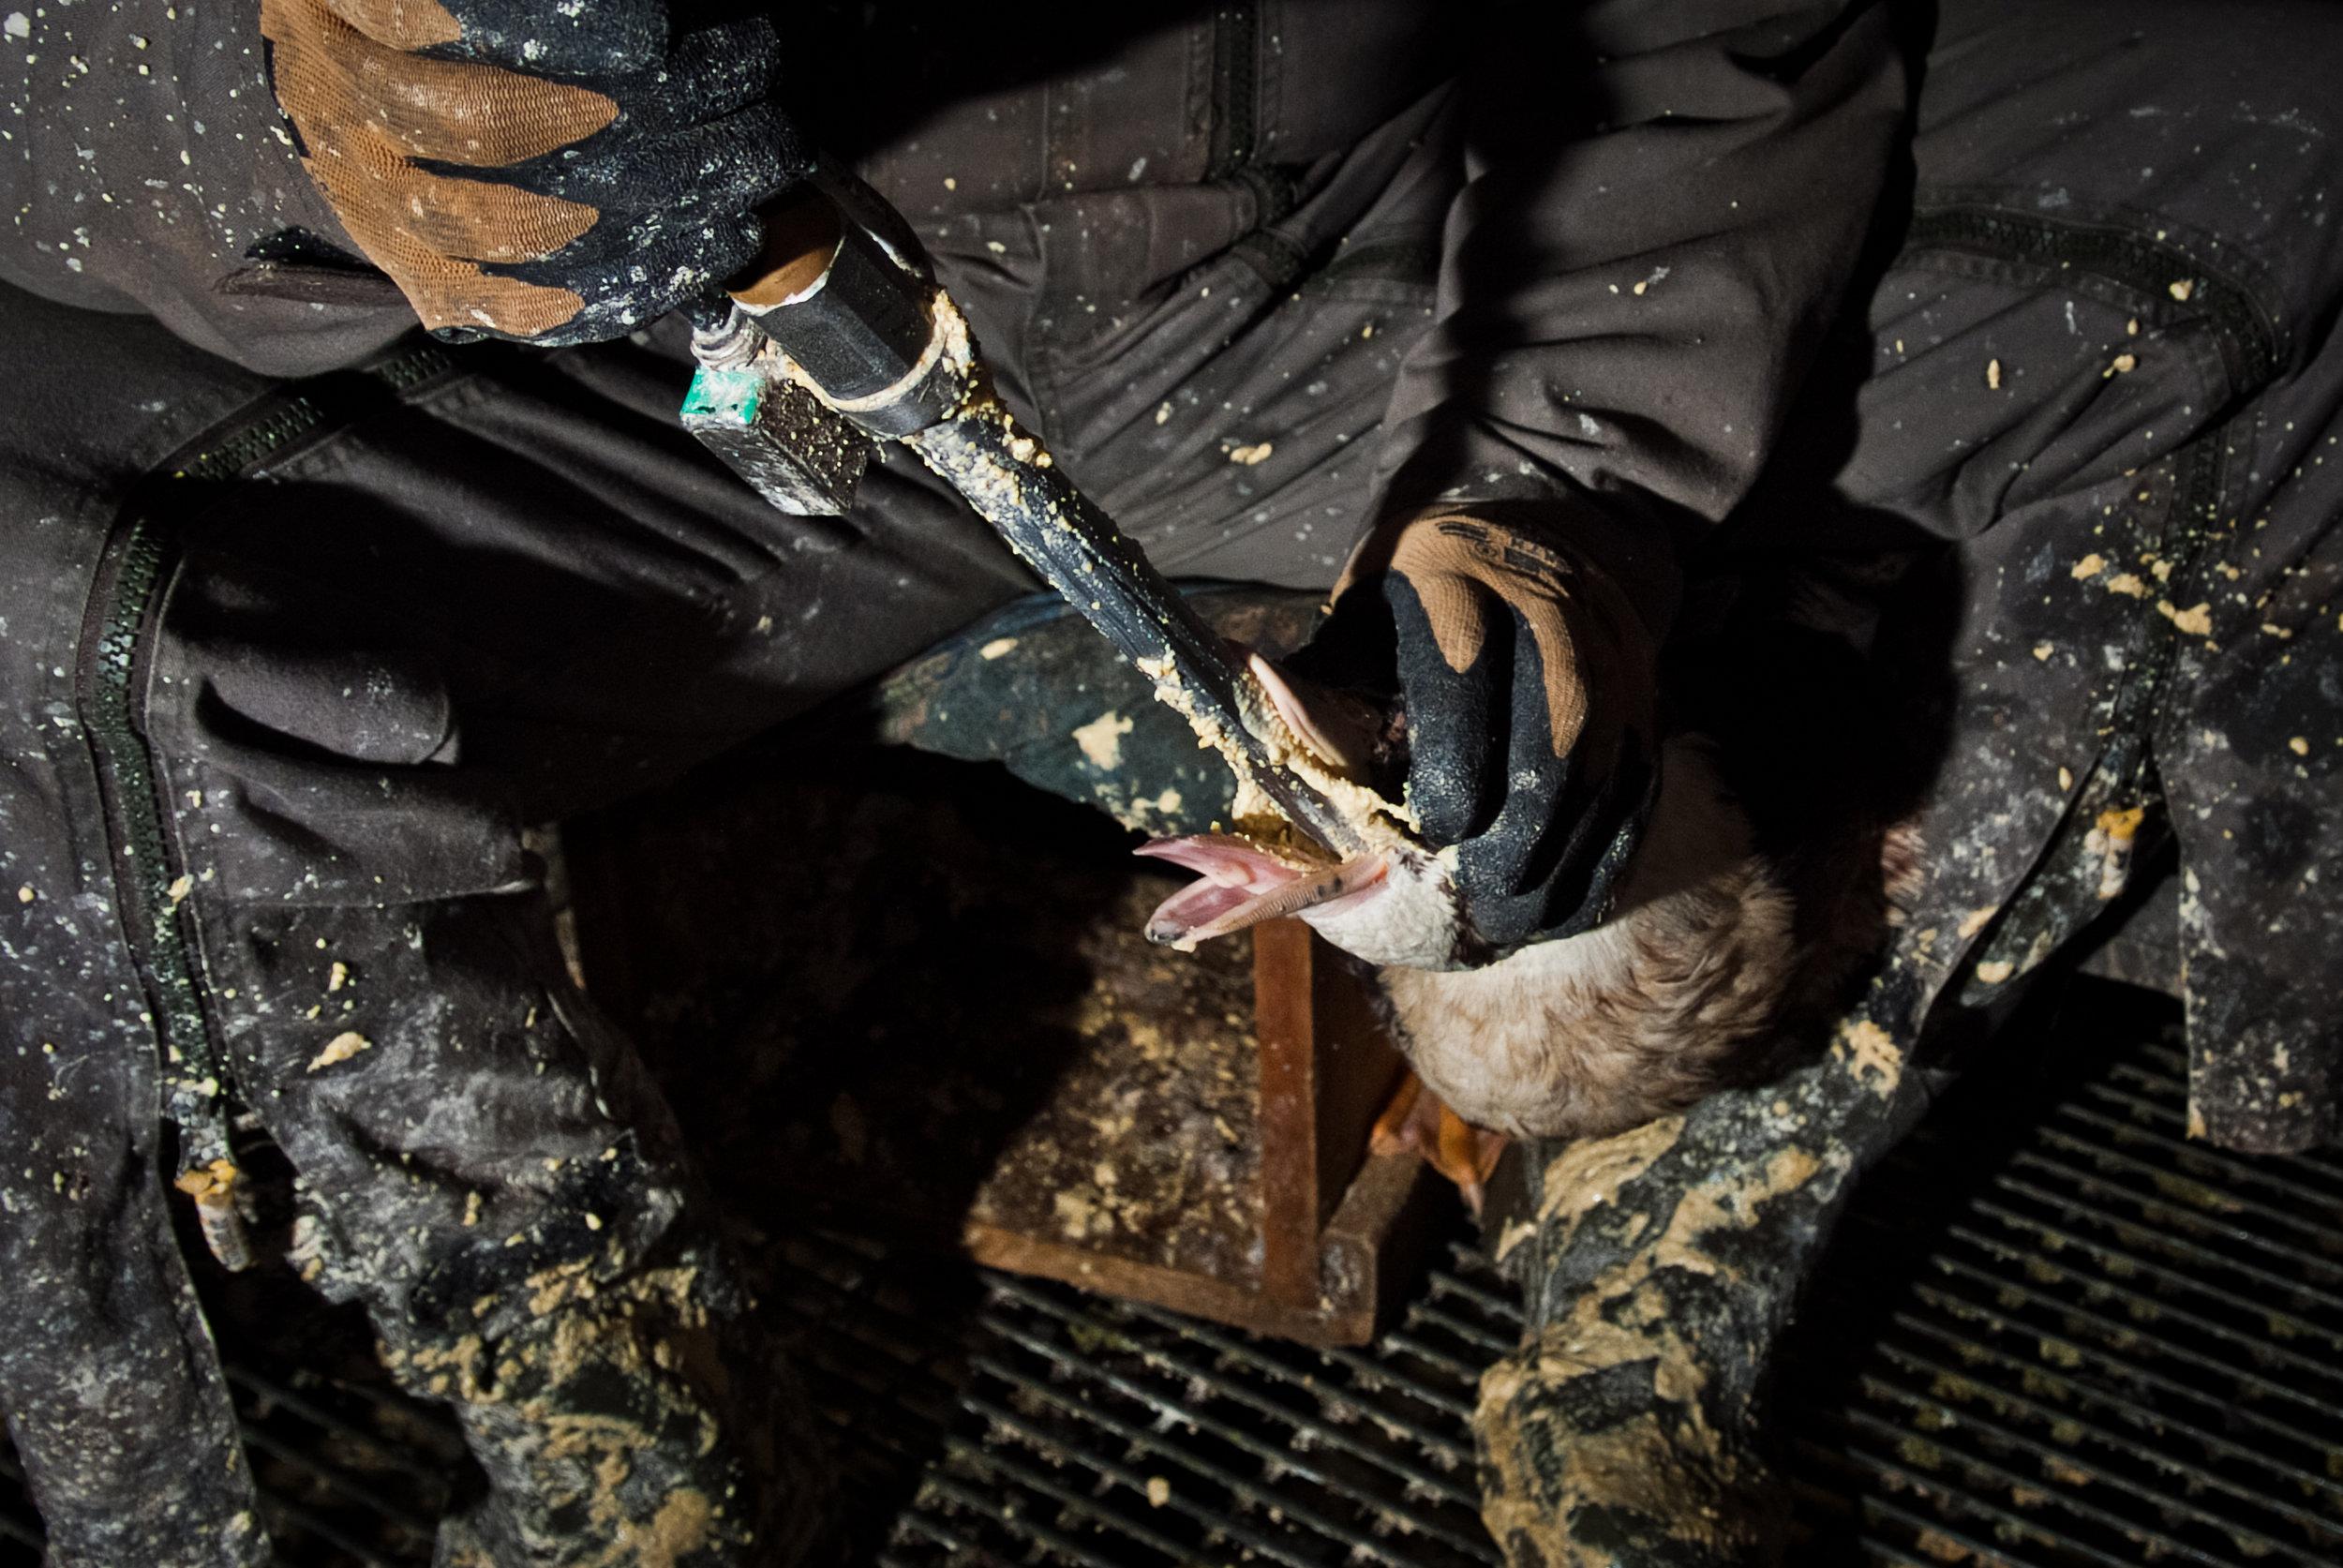 ferme-la-campagnoise---foie-gras_7612052050_o.jpg